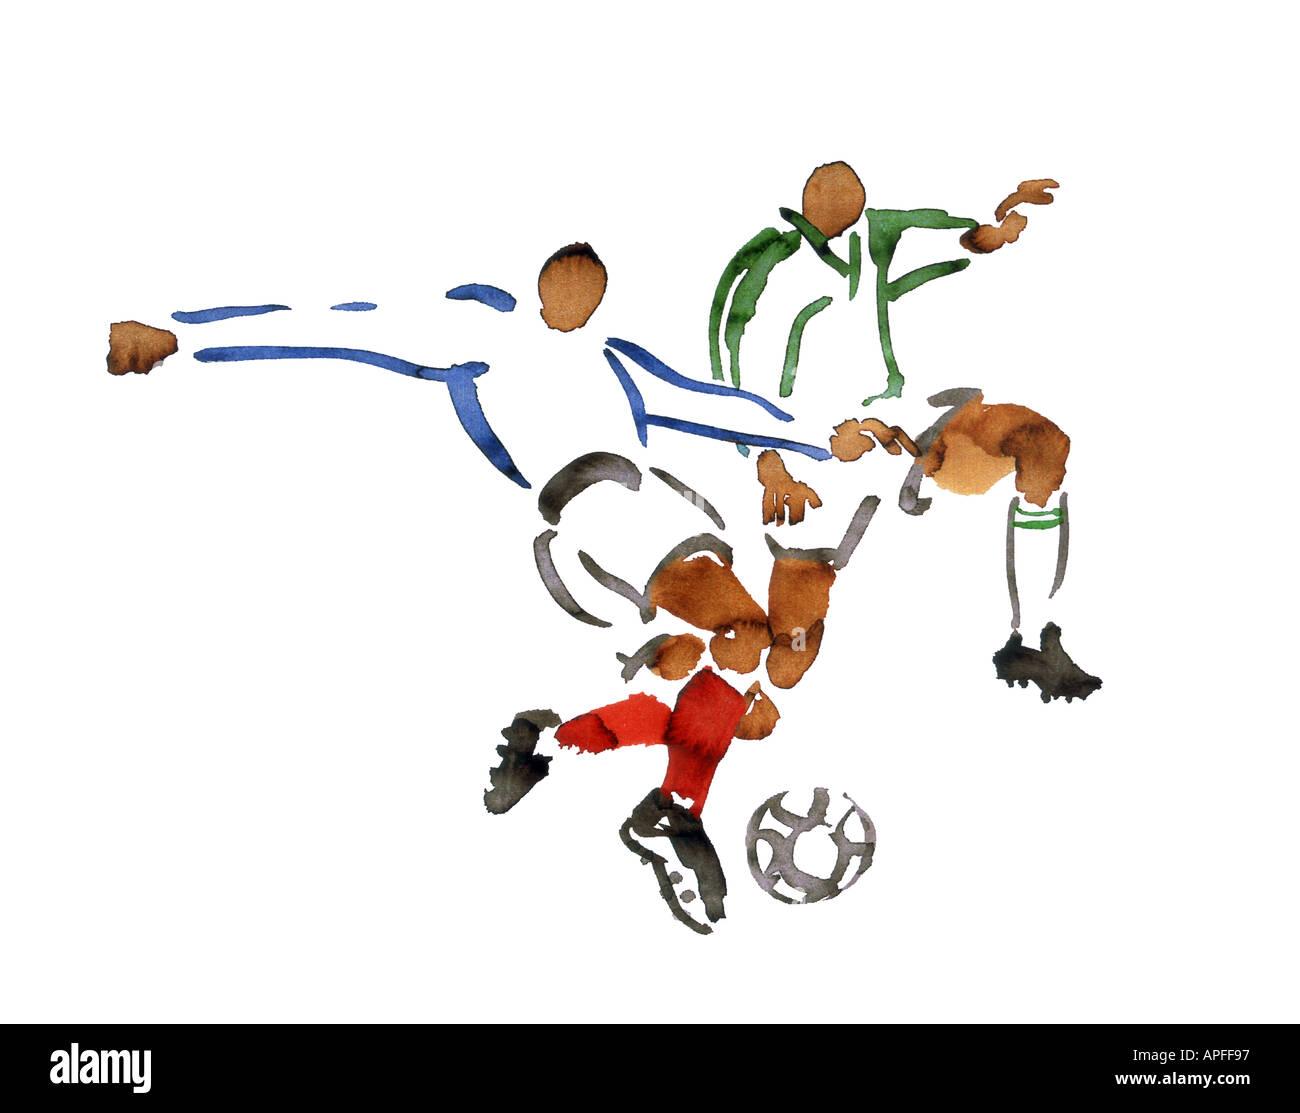 Ball des Sports Illustrationen Team Sports Spiele Fußball Stockbild